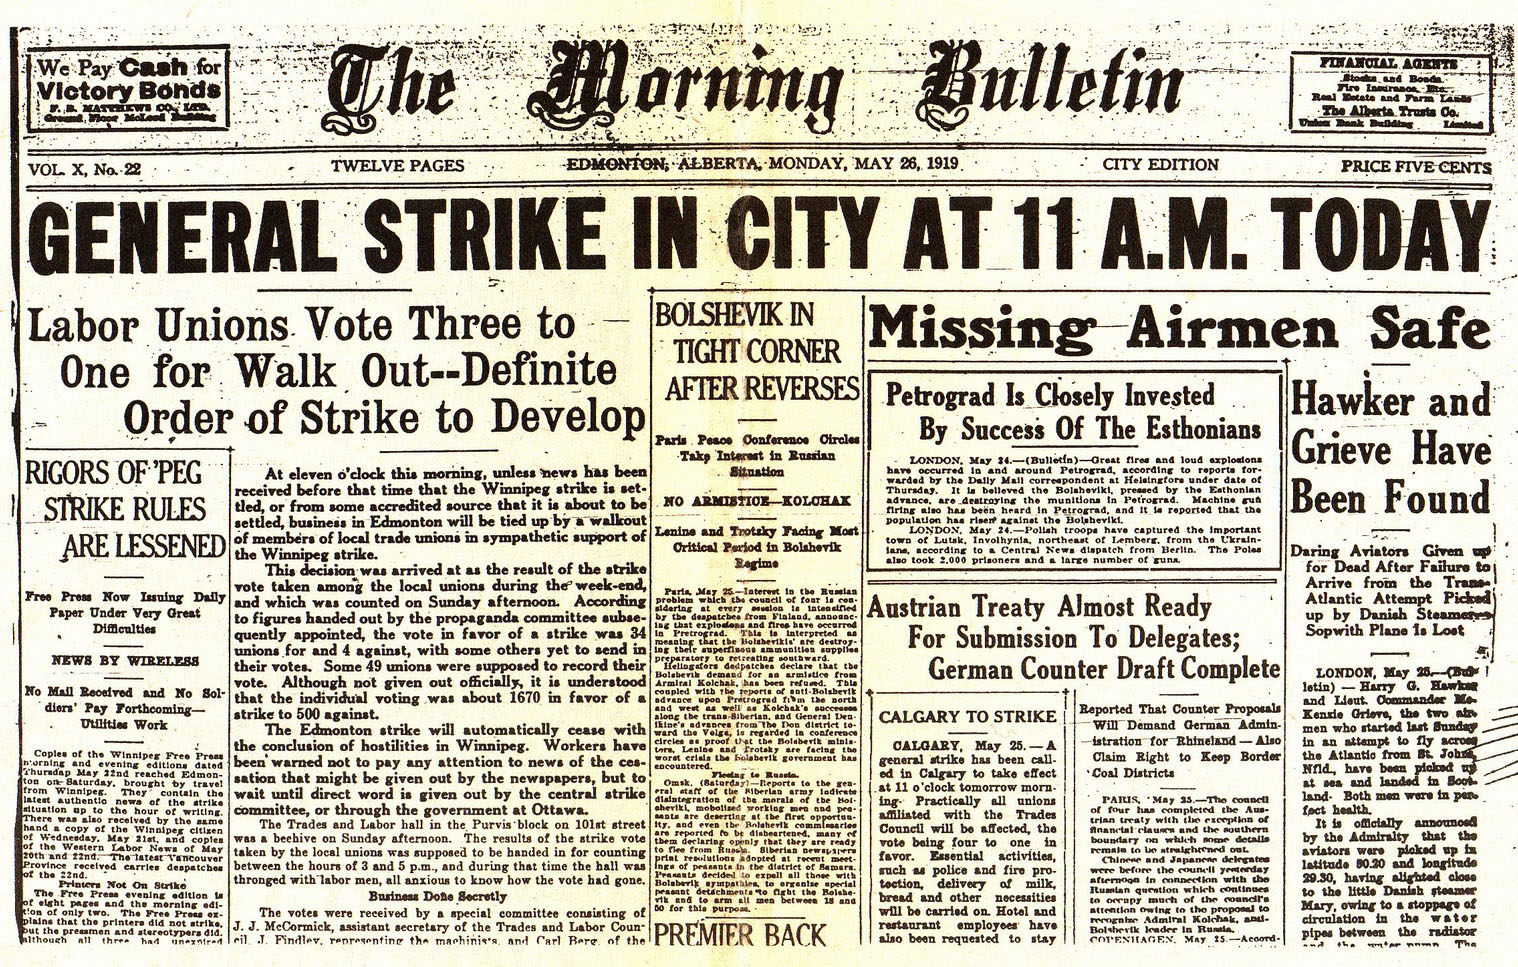 Объявление о начале забастовки.